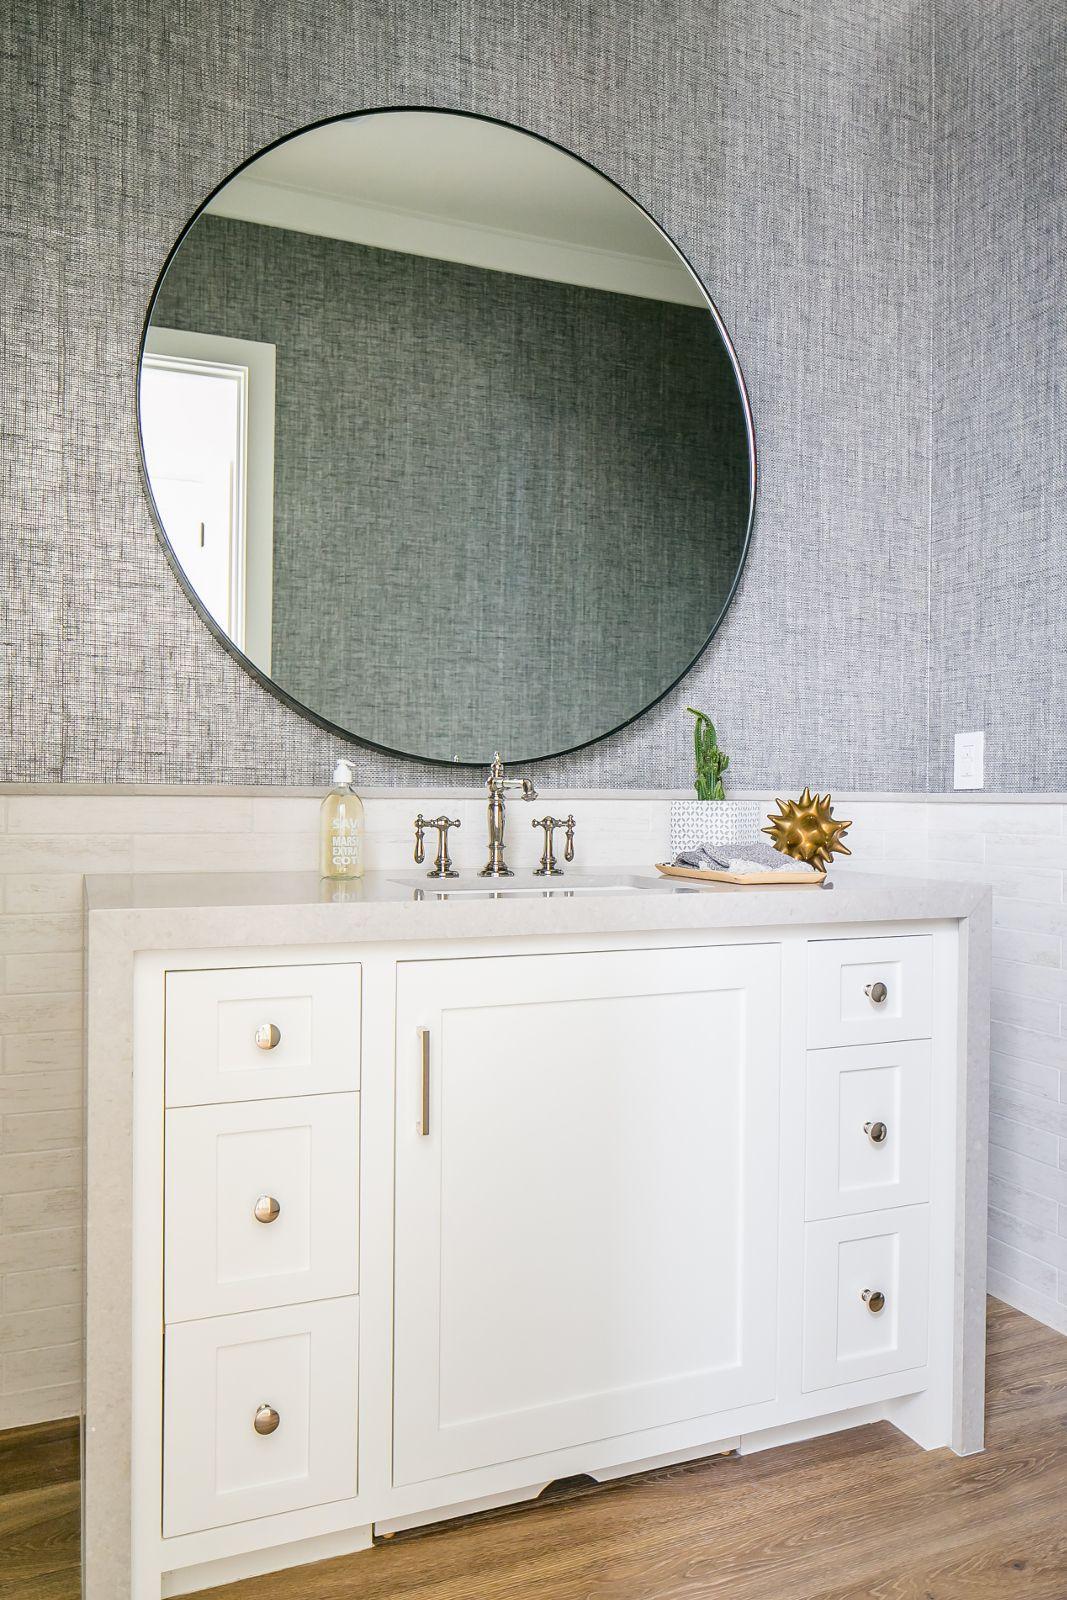 Cardiff image 11  Wallpaper accent wall bathroom, Bathroom